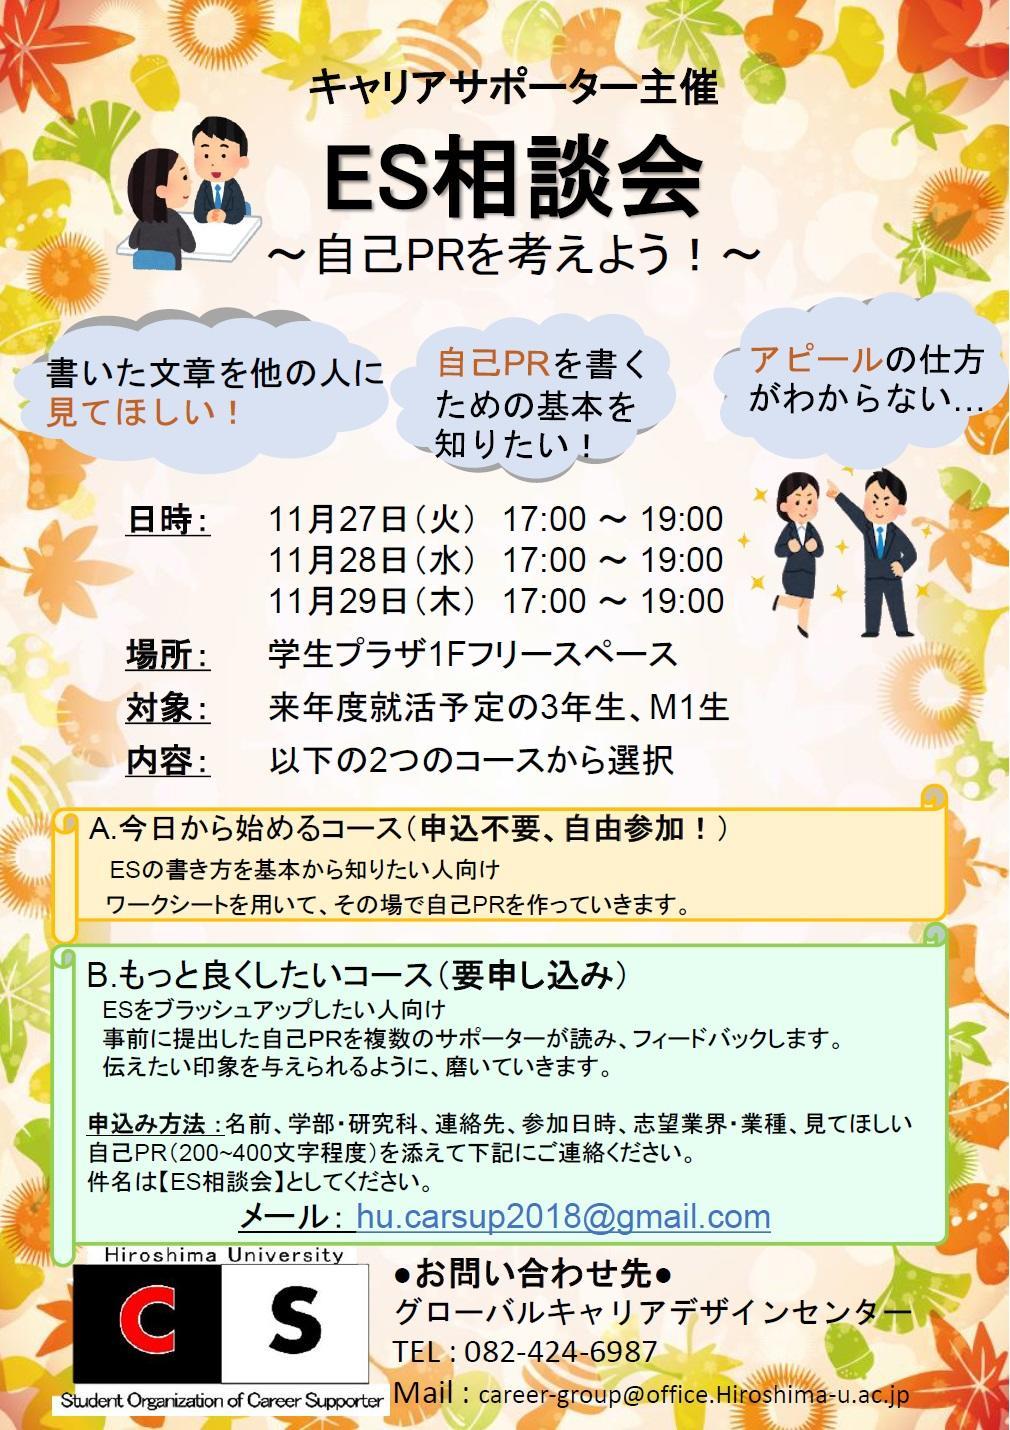 ES(エントリーシート)相談会開催!【キャリアサポーター】